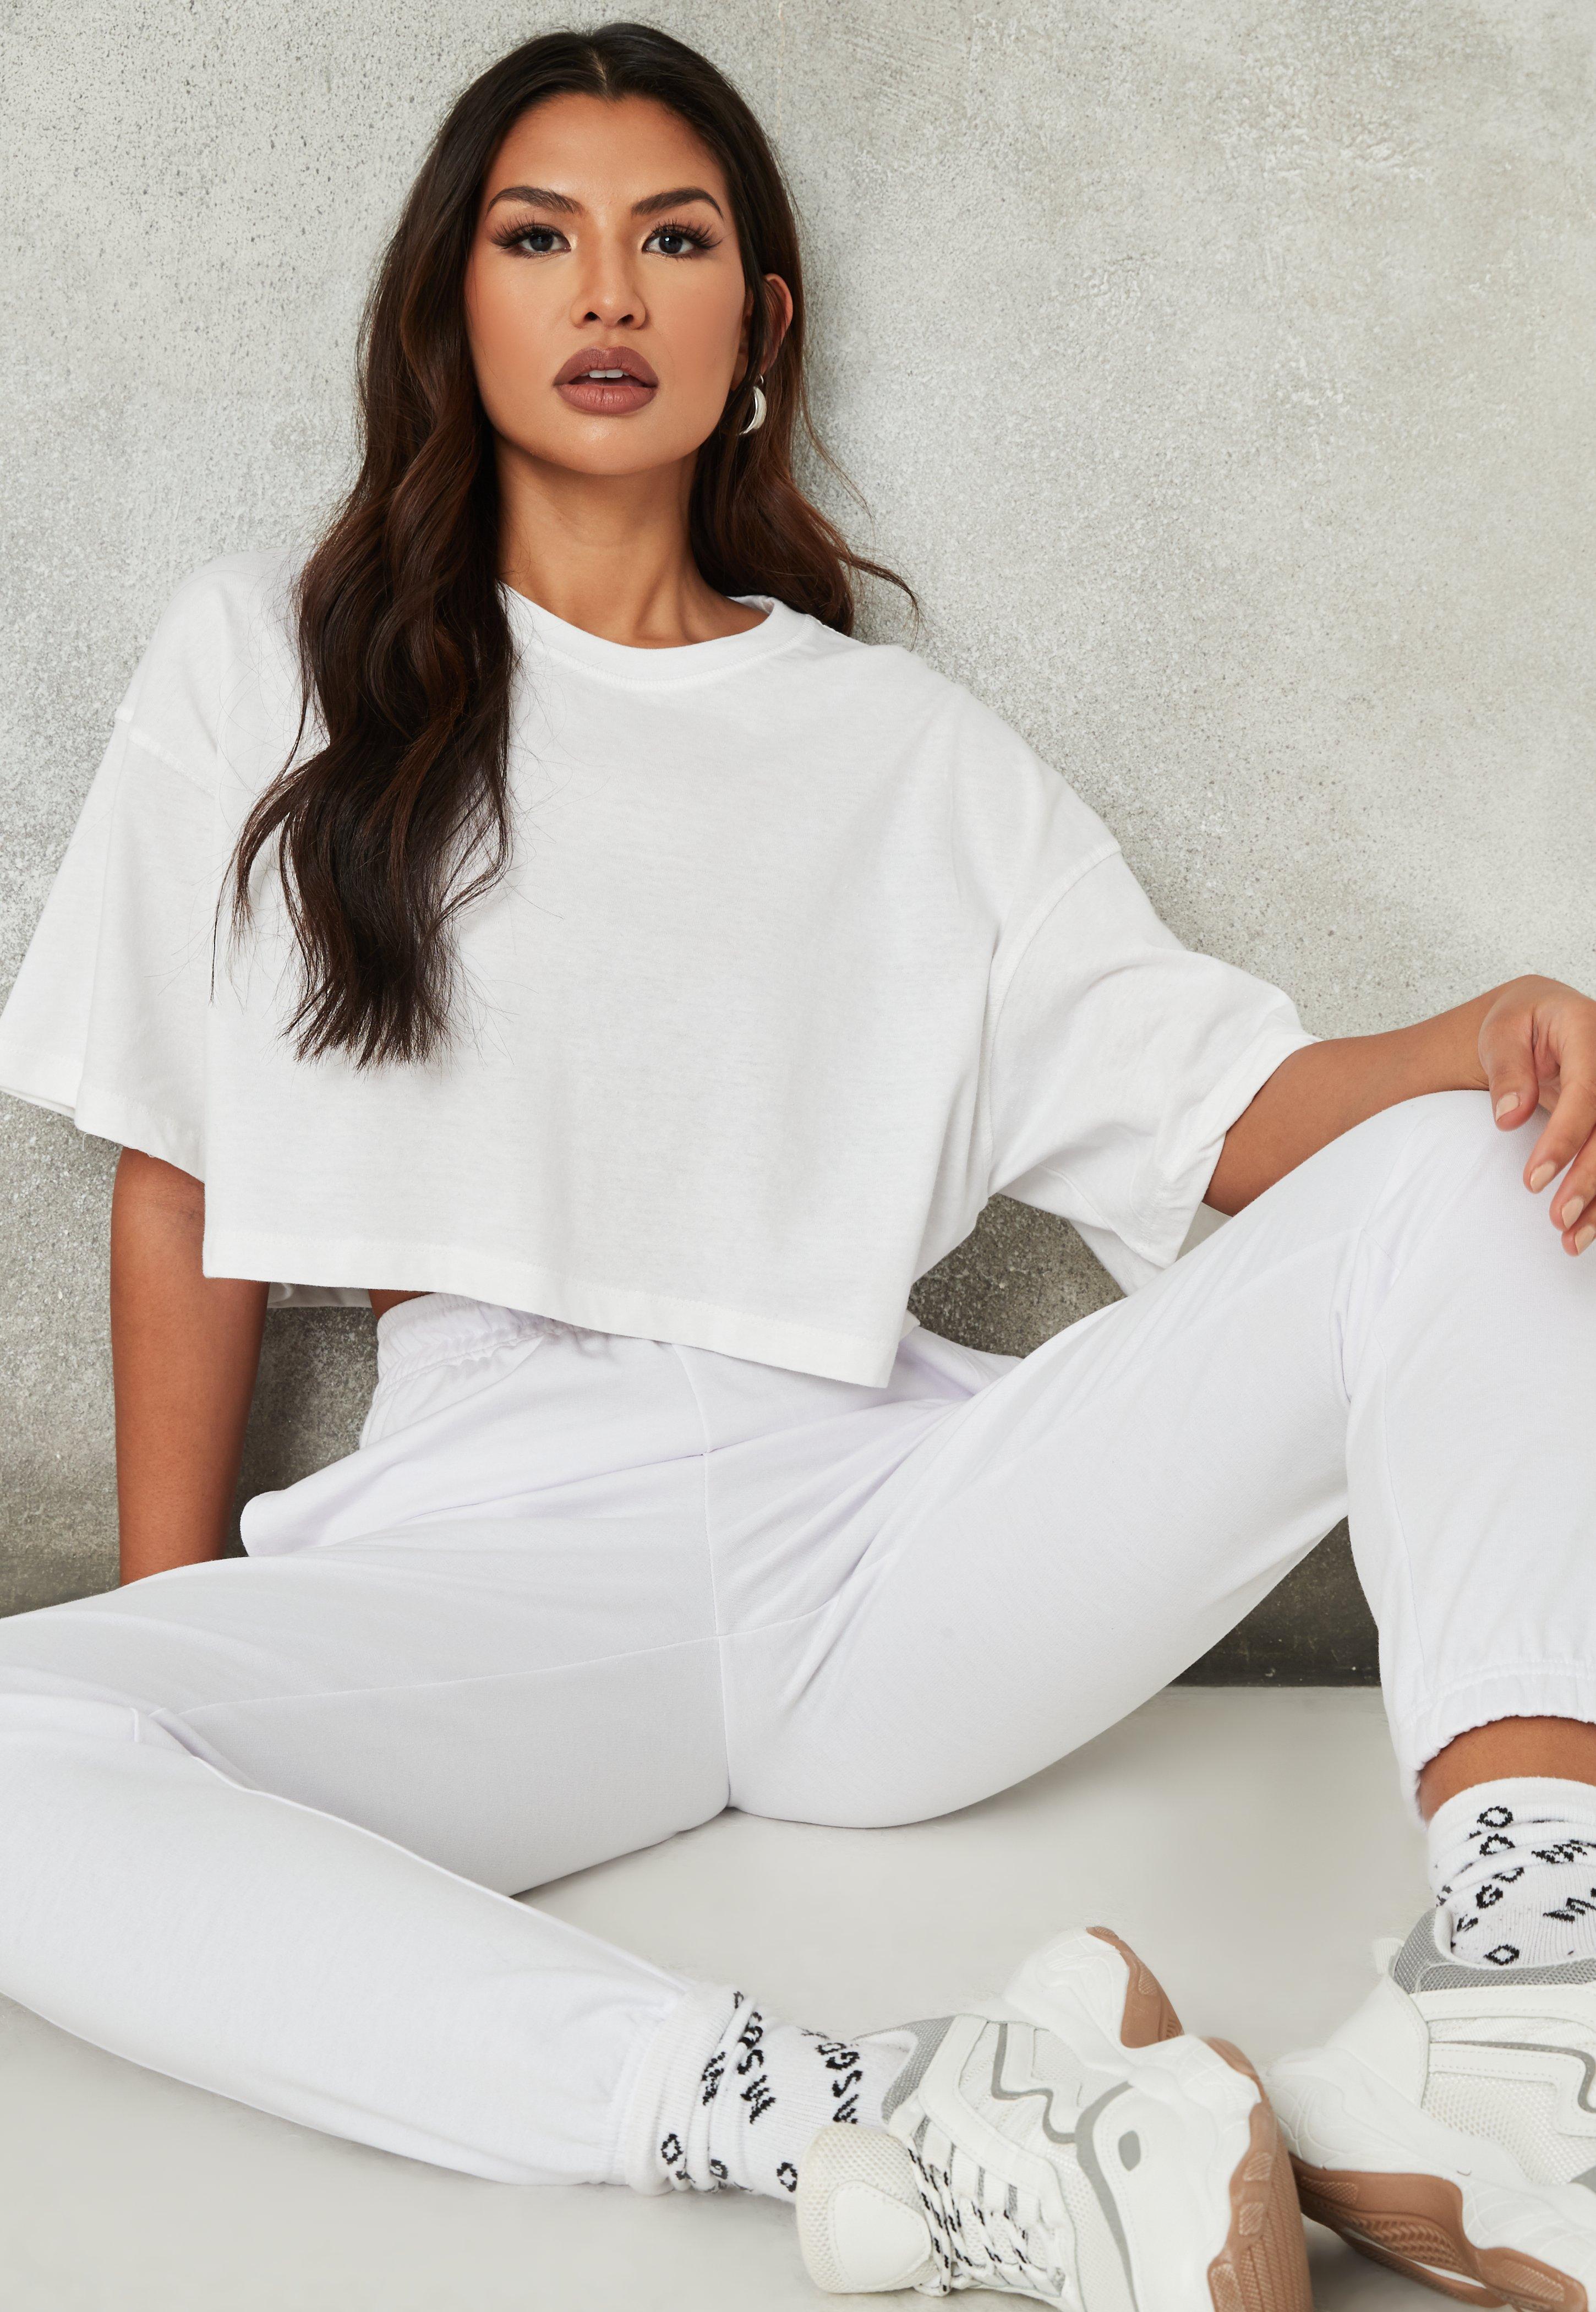 ufficiale Antecedente telaio  White Drop Shoulder Oversized Crop Top   Missguided